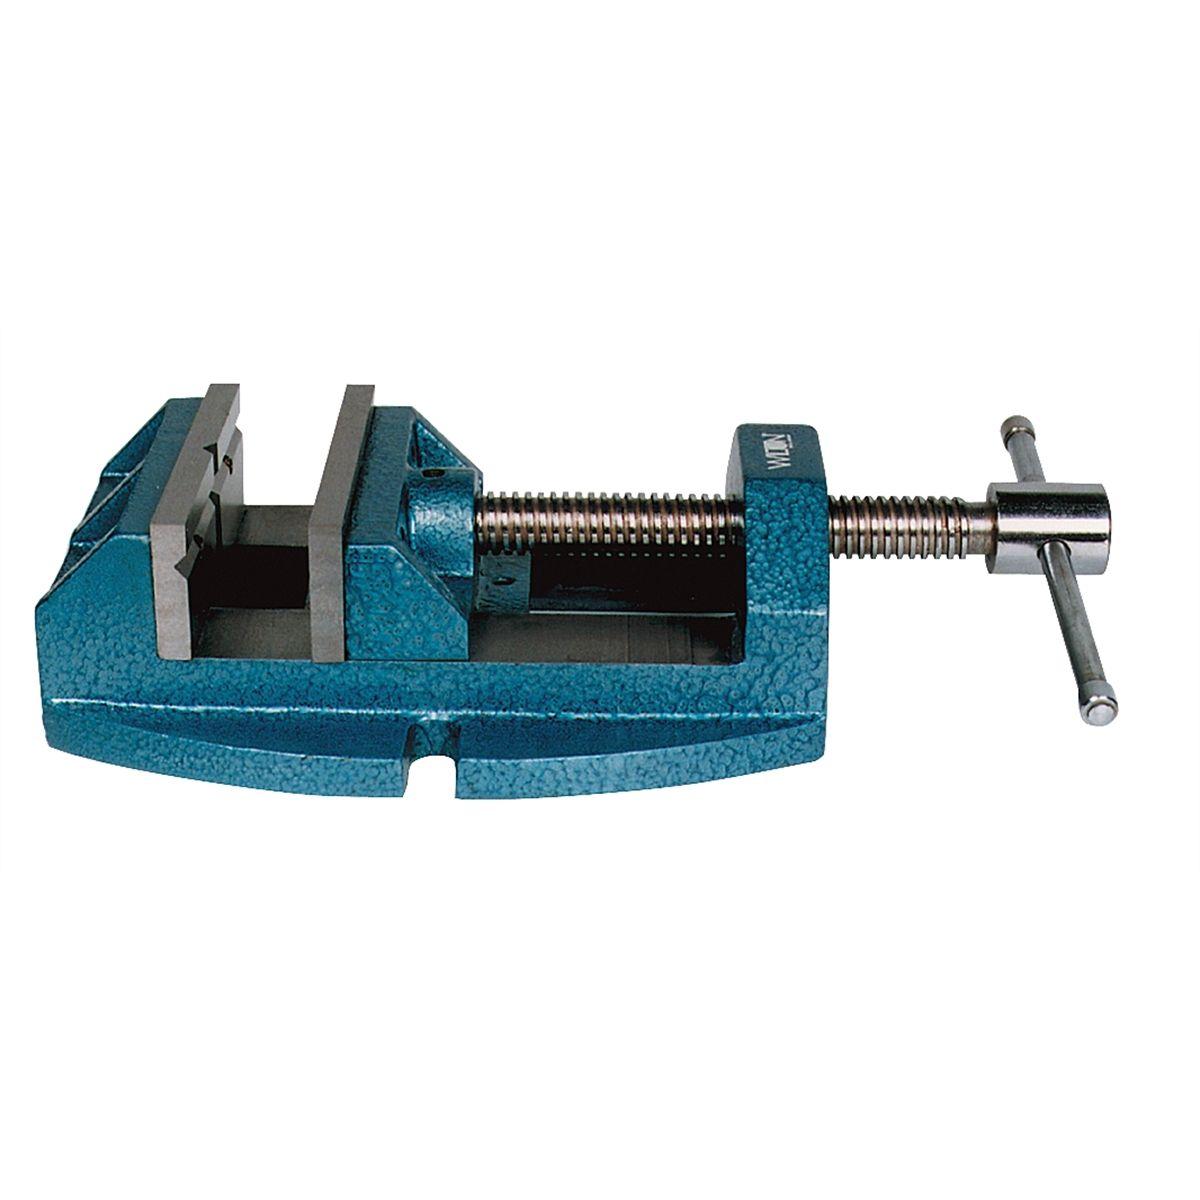 Utility Drill Press Vise Continuous Nut Wilton